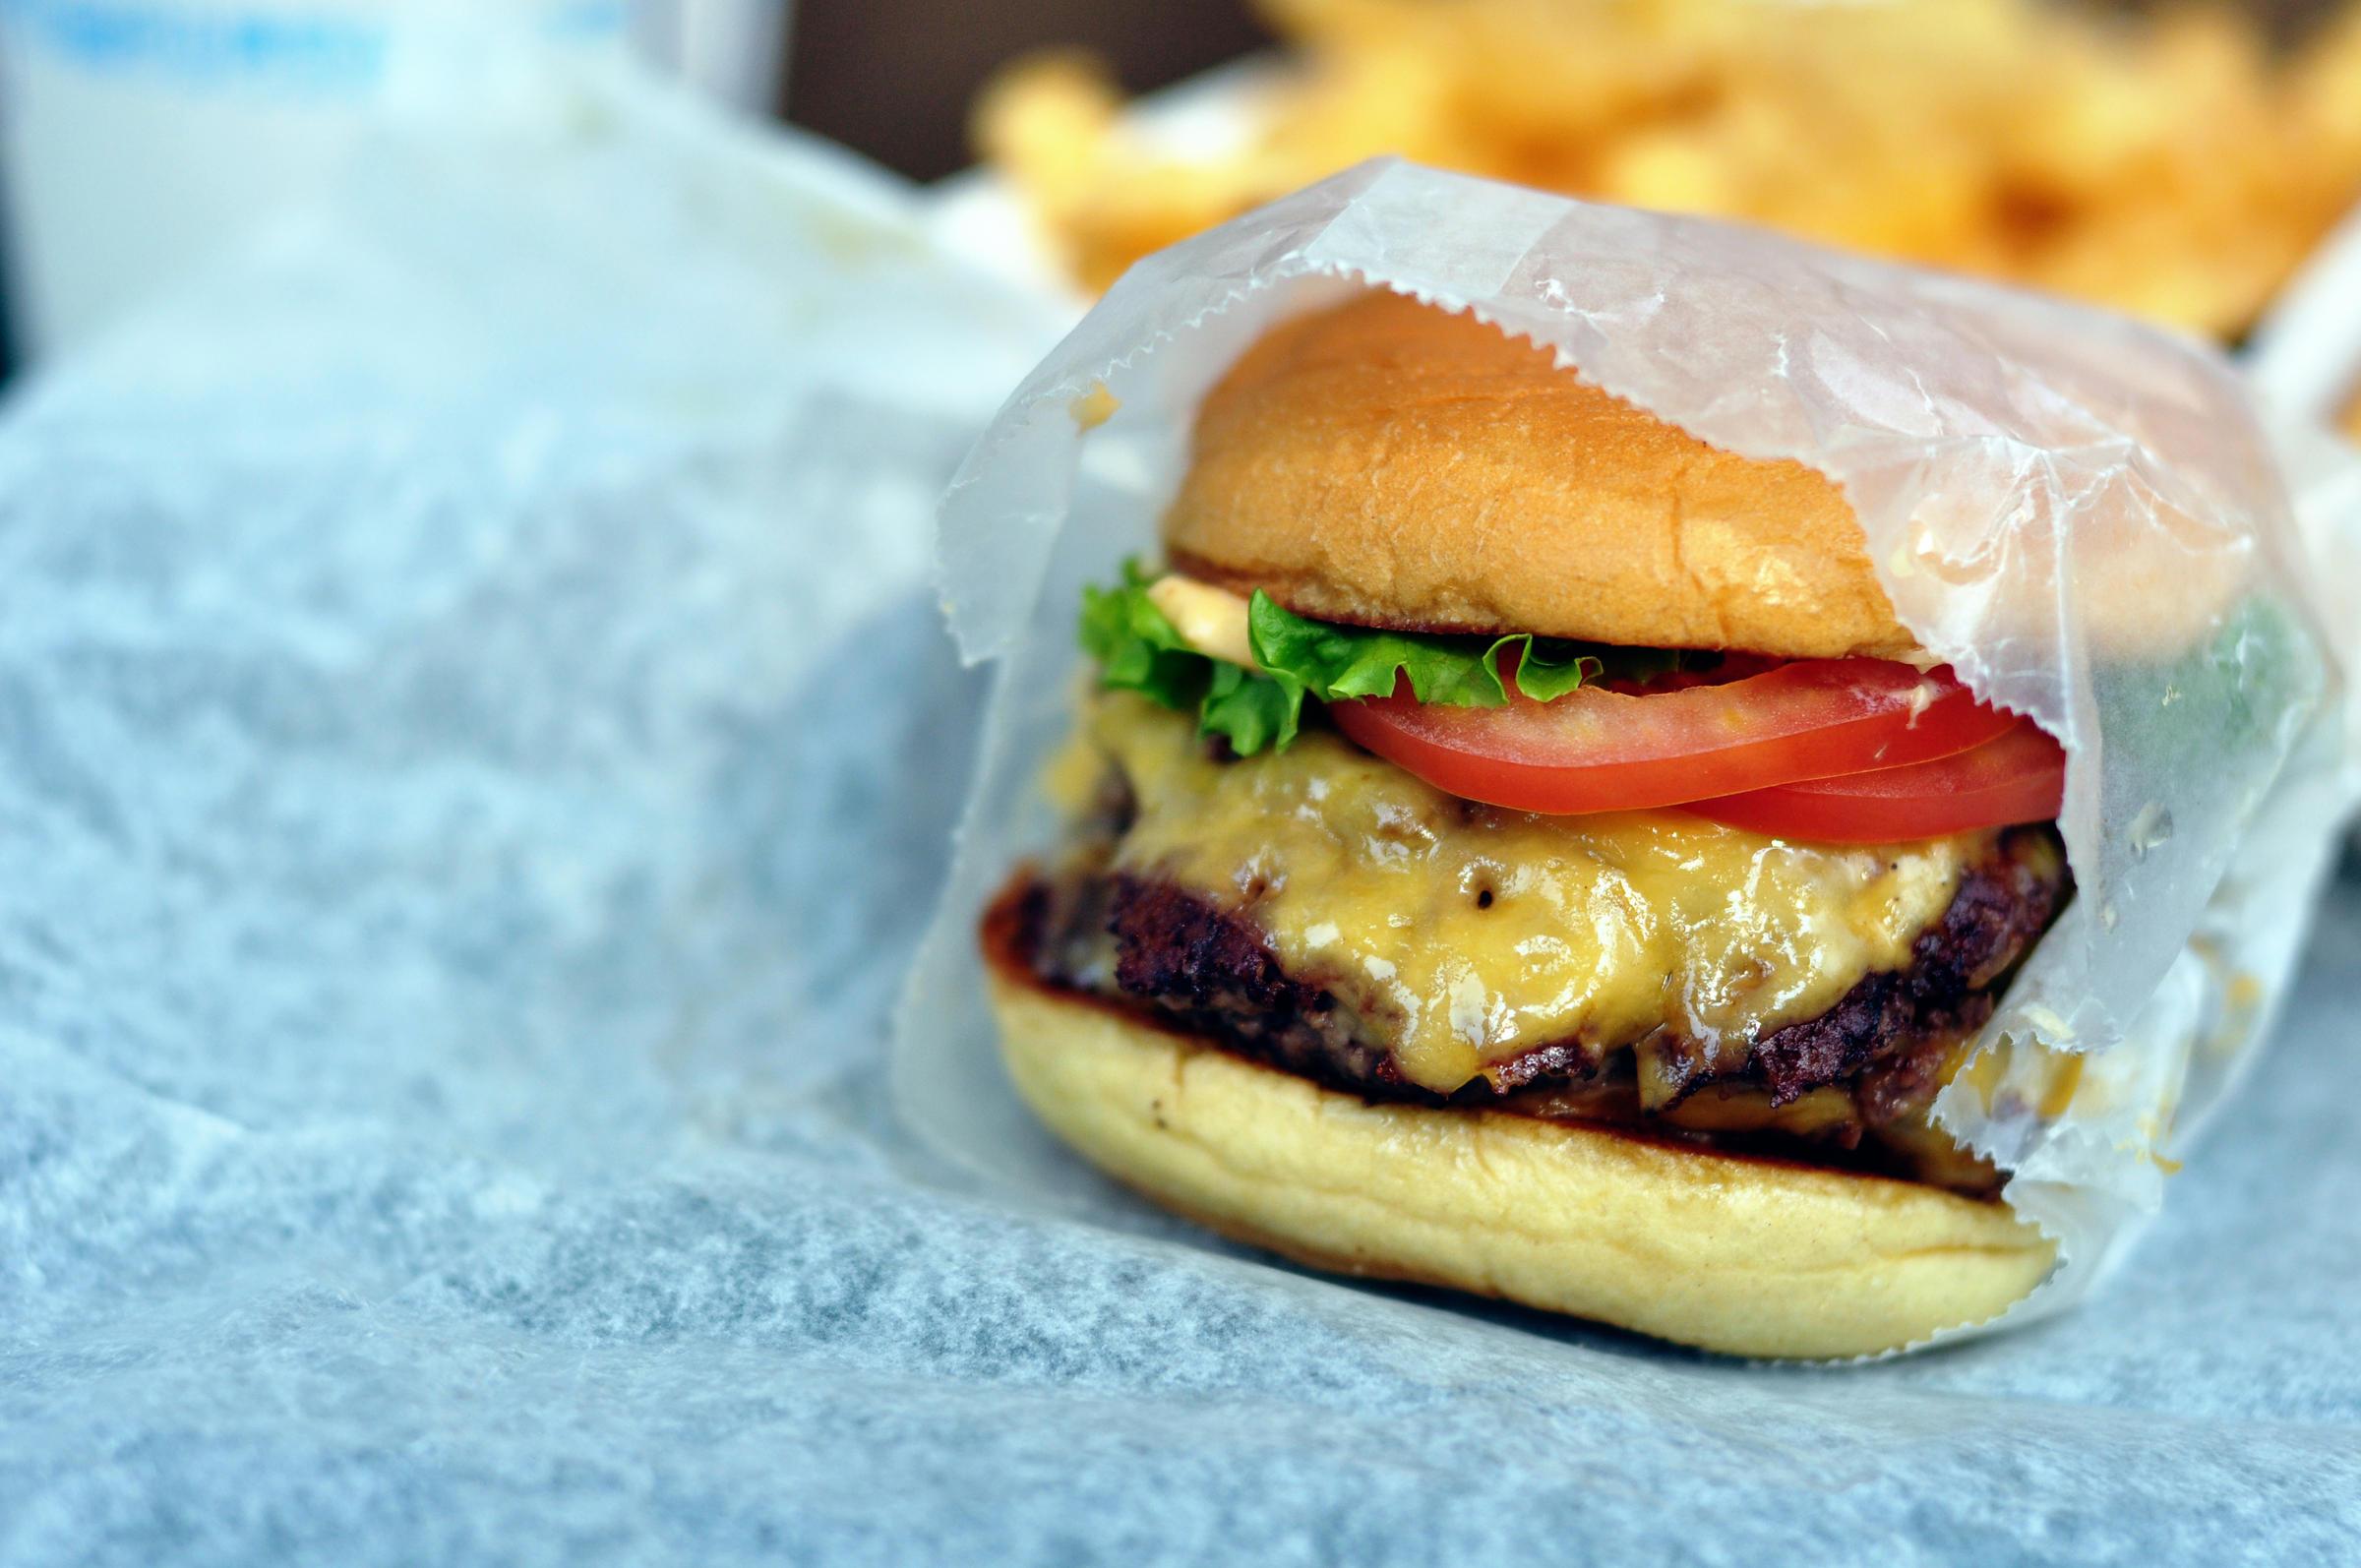 Kansas City Restaurant News Fall 2018 Openings And Closings